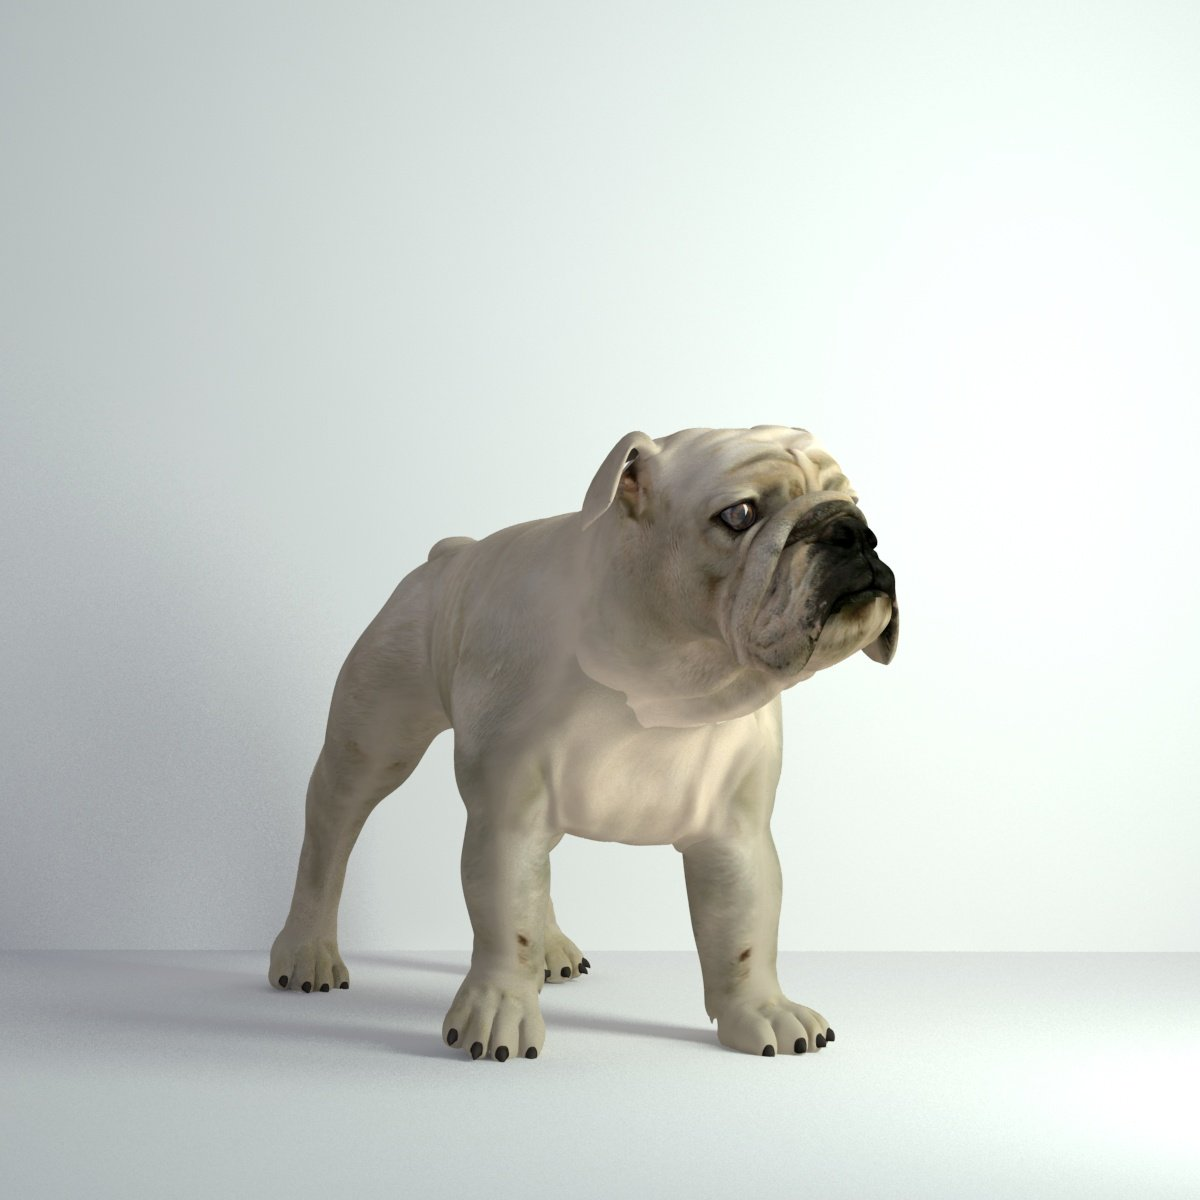 Bulldog 3D Model in Dog 3DExport